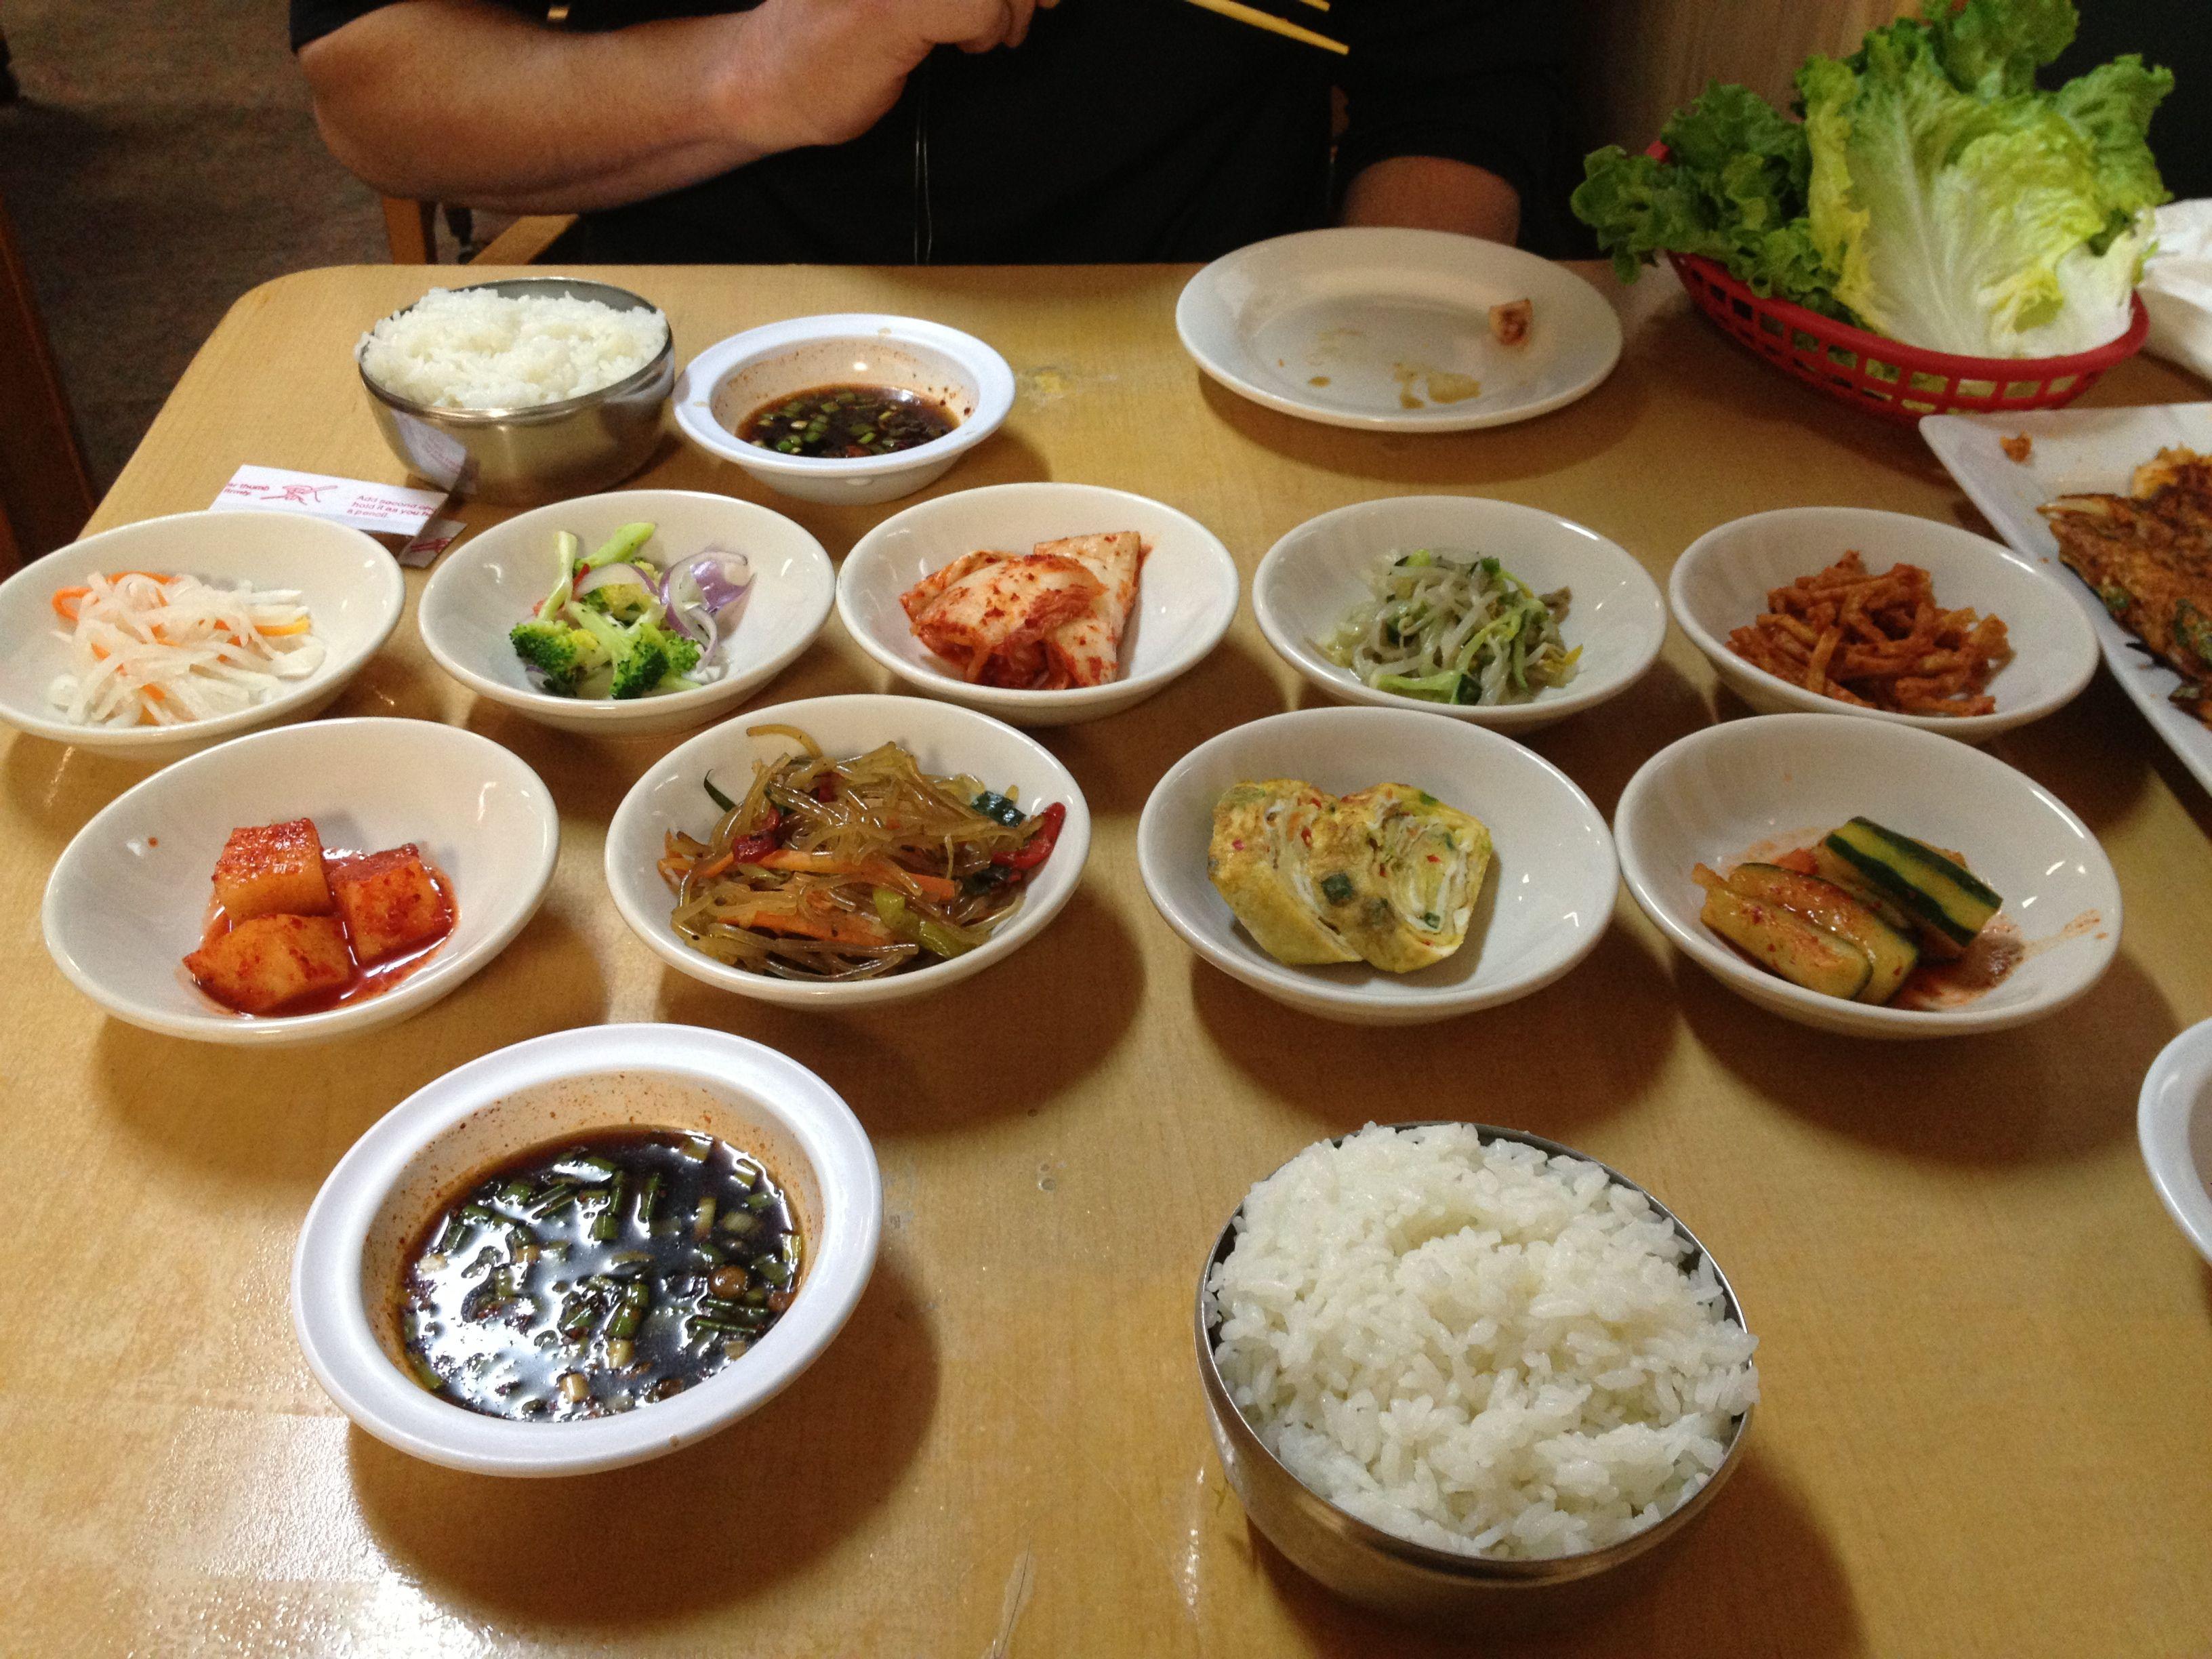 Banchans At Koreana Restaurant In San Antonio Texas Yummy Authentic Korean Food Very Good To Know Food Good Food Authentic Korean Food